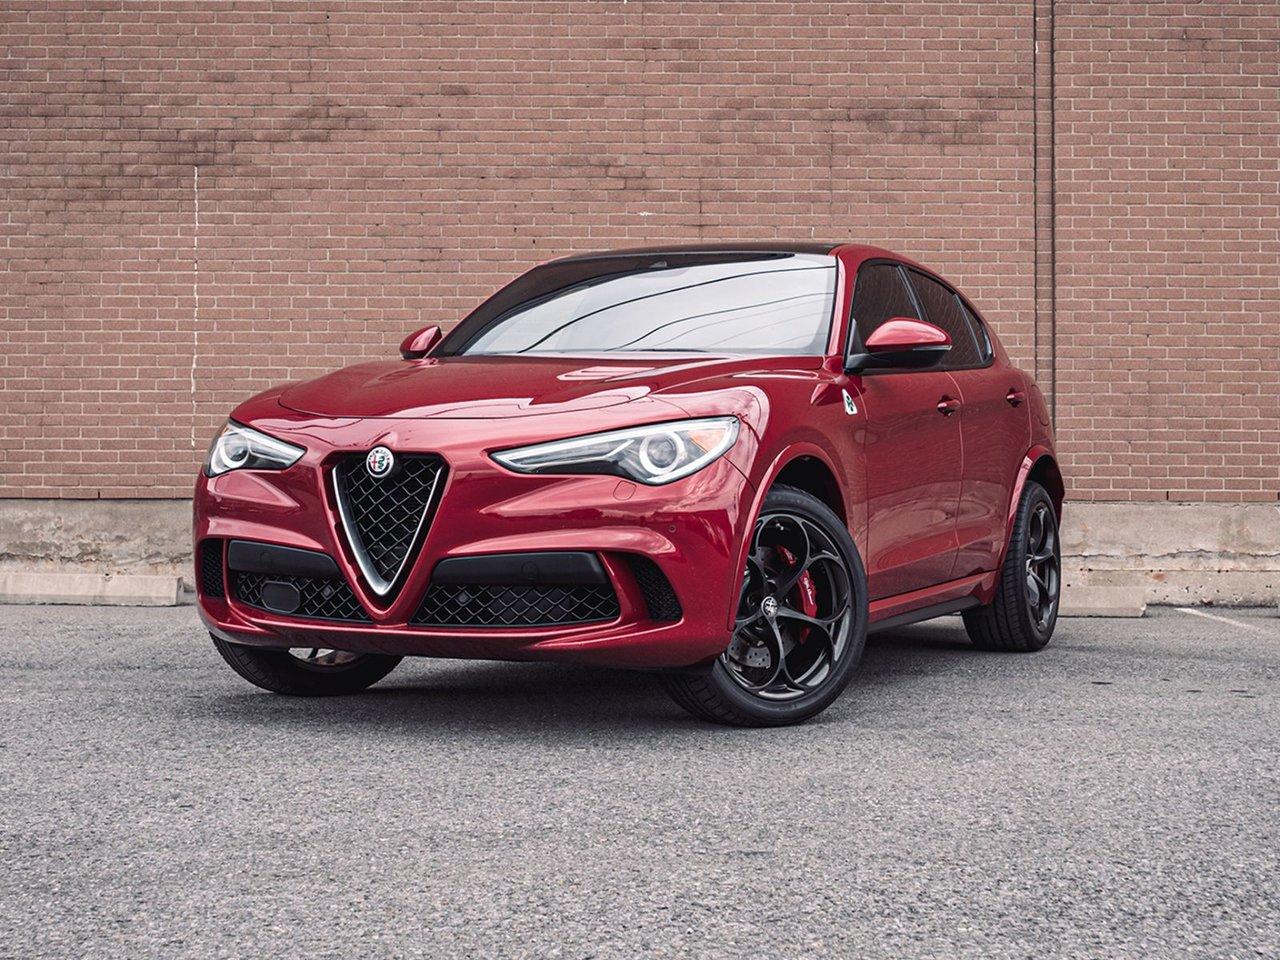 Alfa Romeo Stelvio 2018 Quadrifoglio